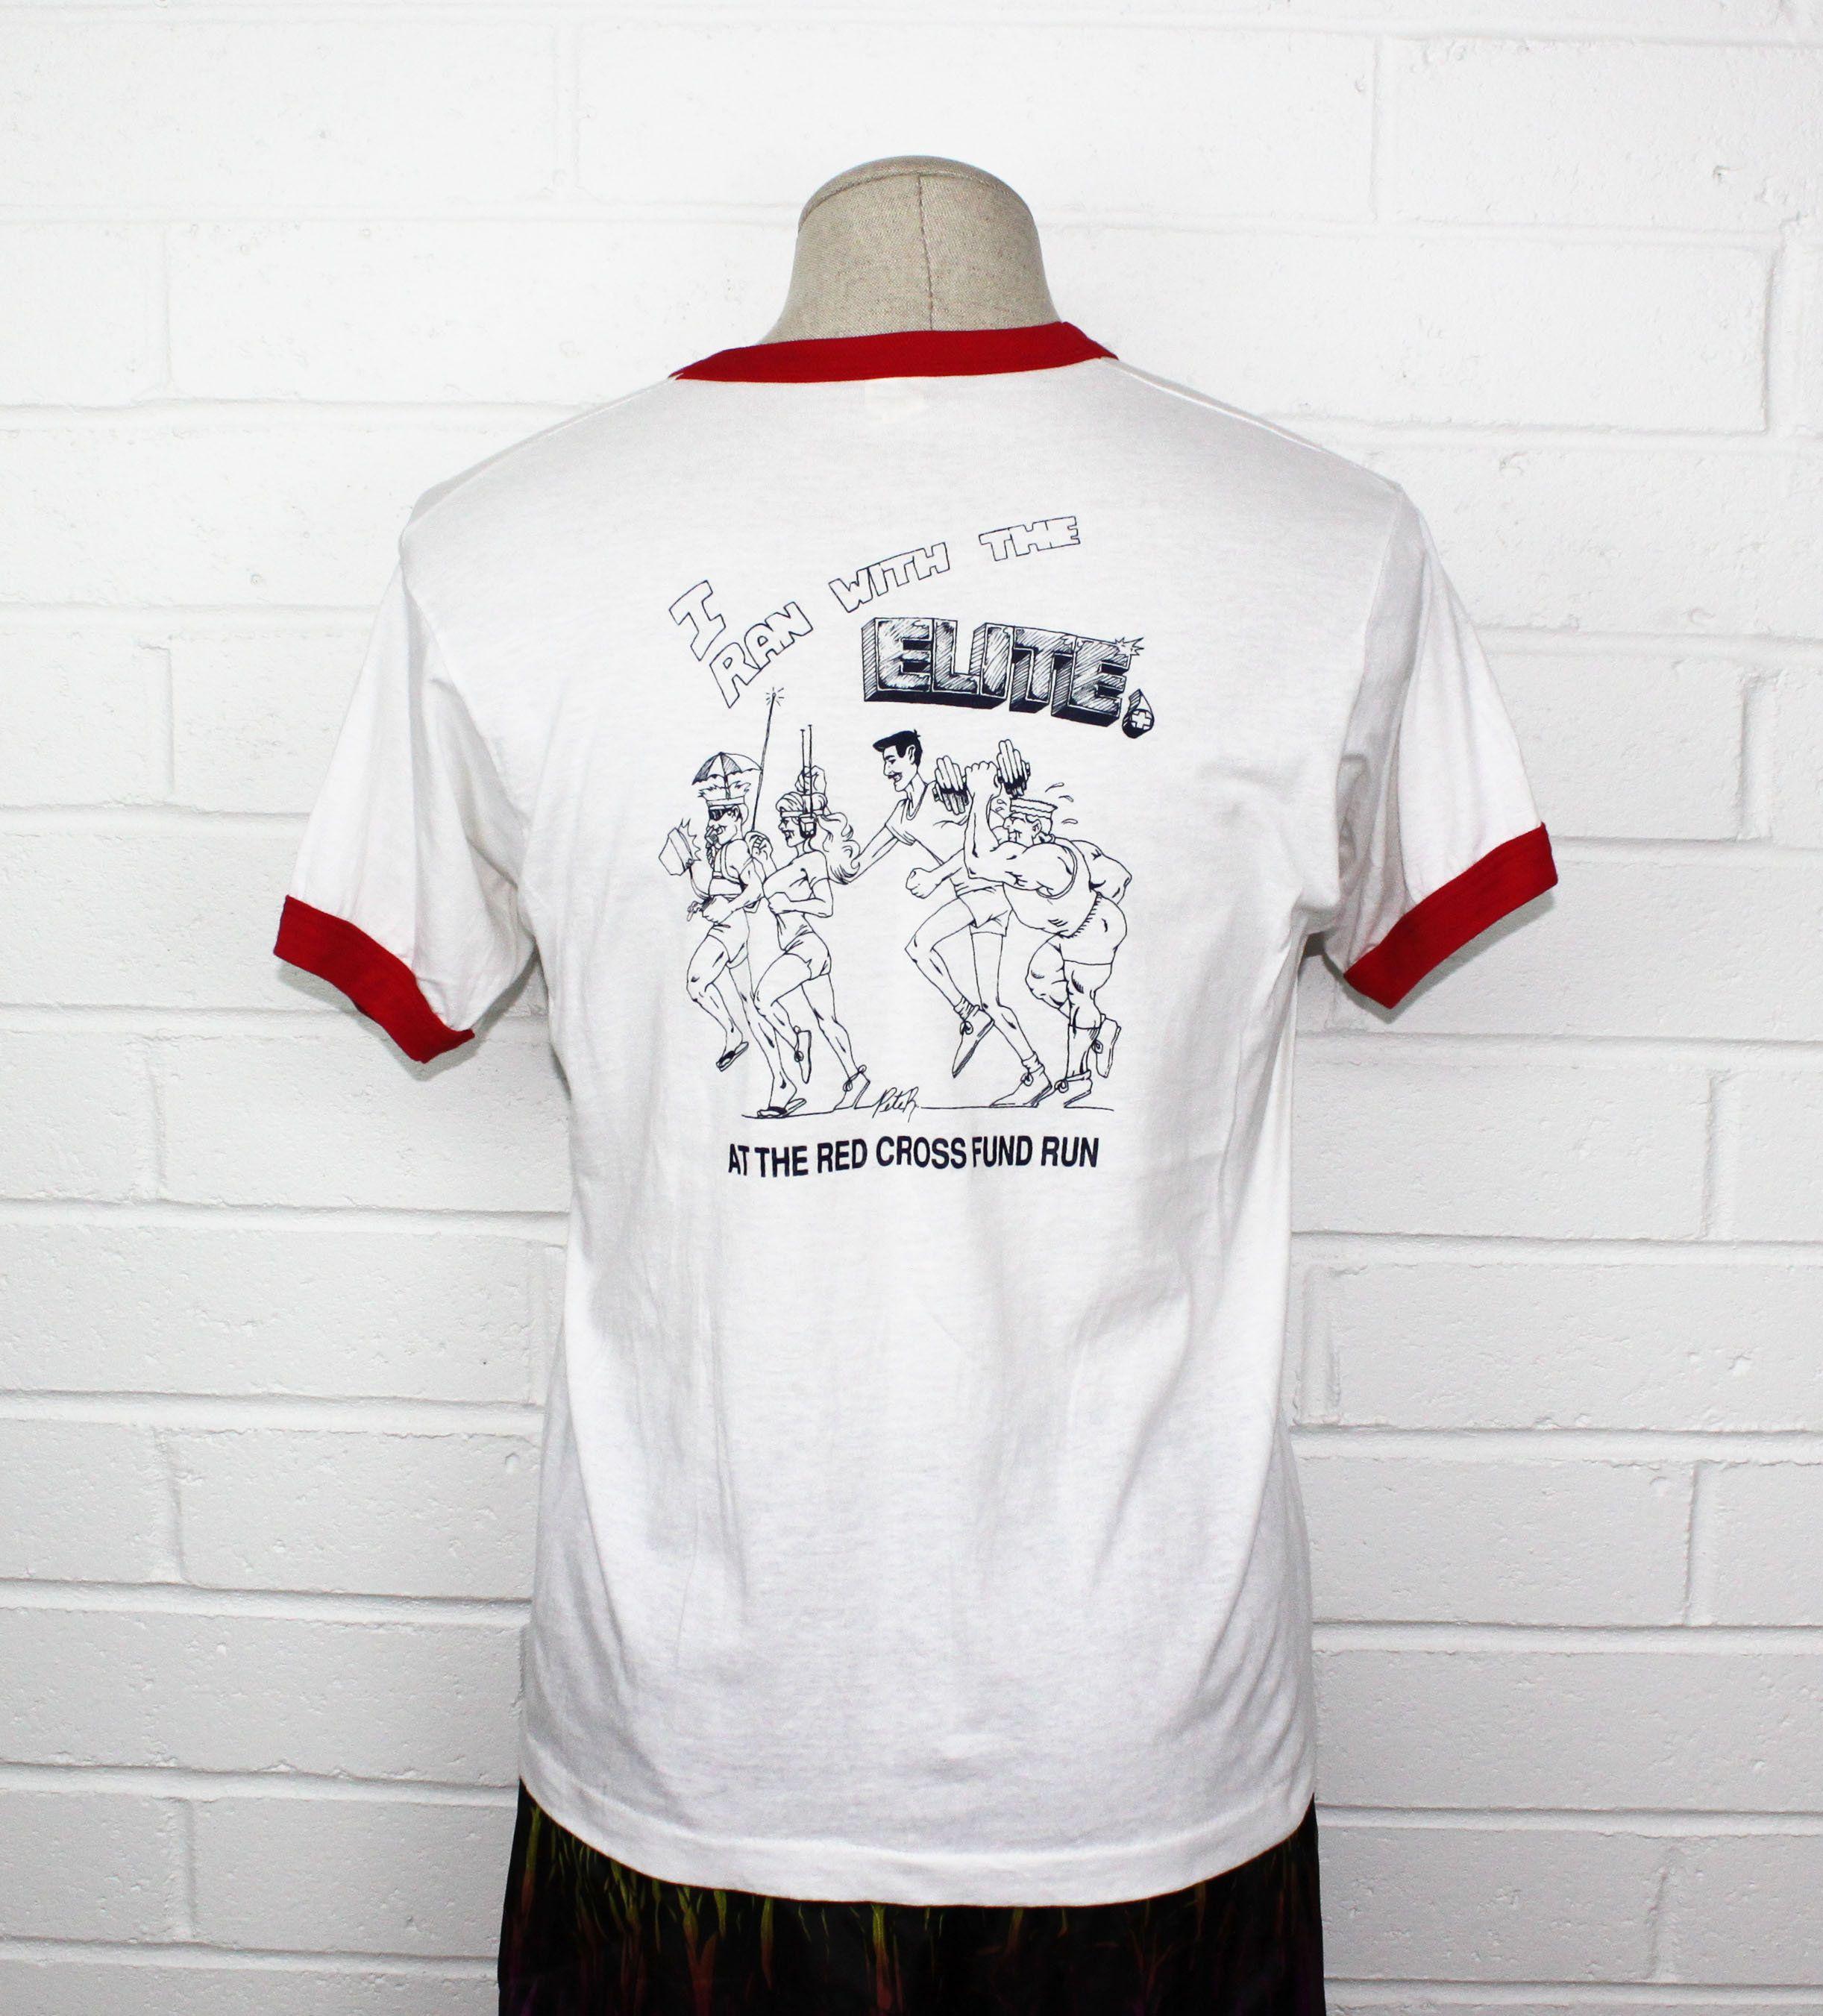 Vintage 80s 1980s Red Ringer Shirt marathon Red Cross Run